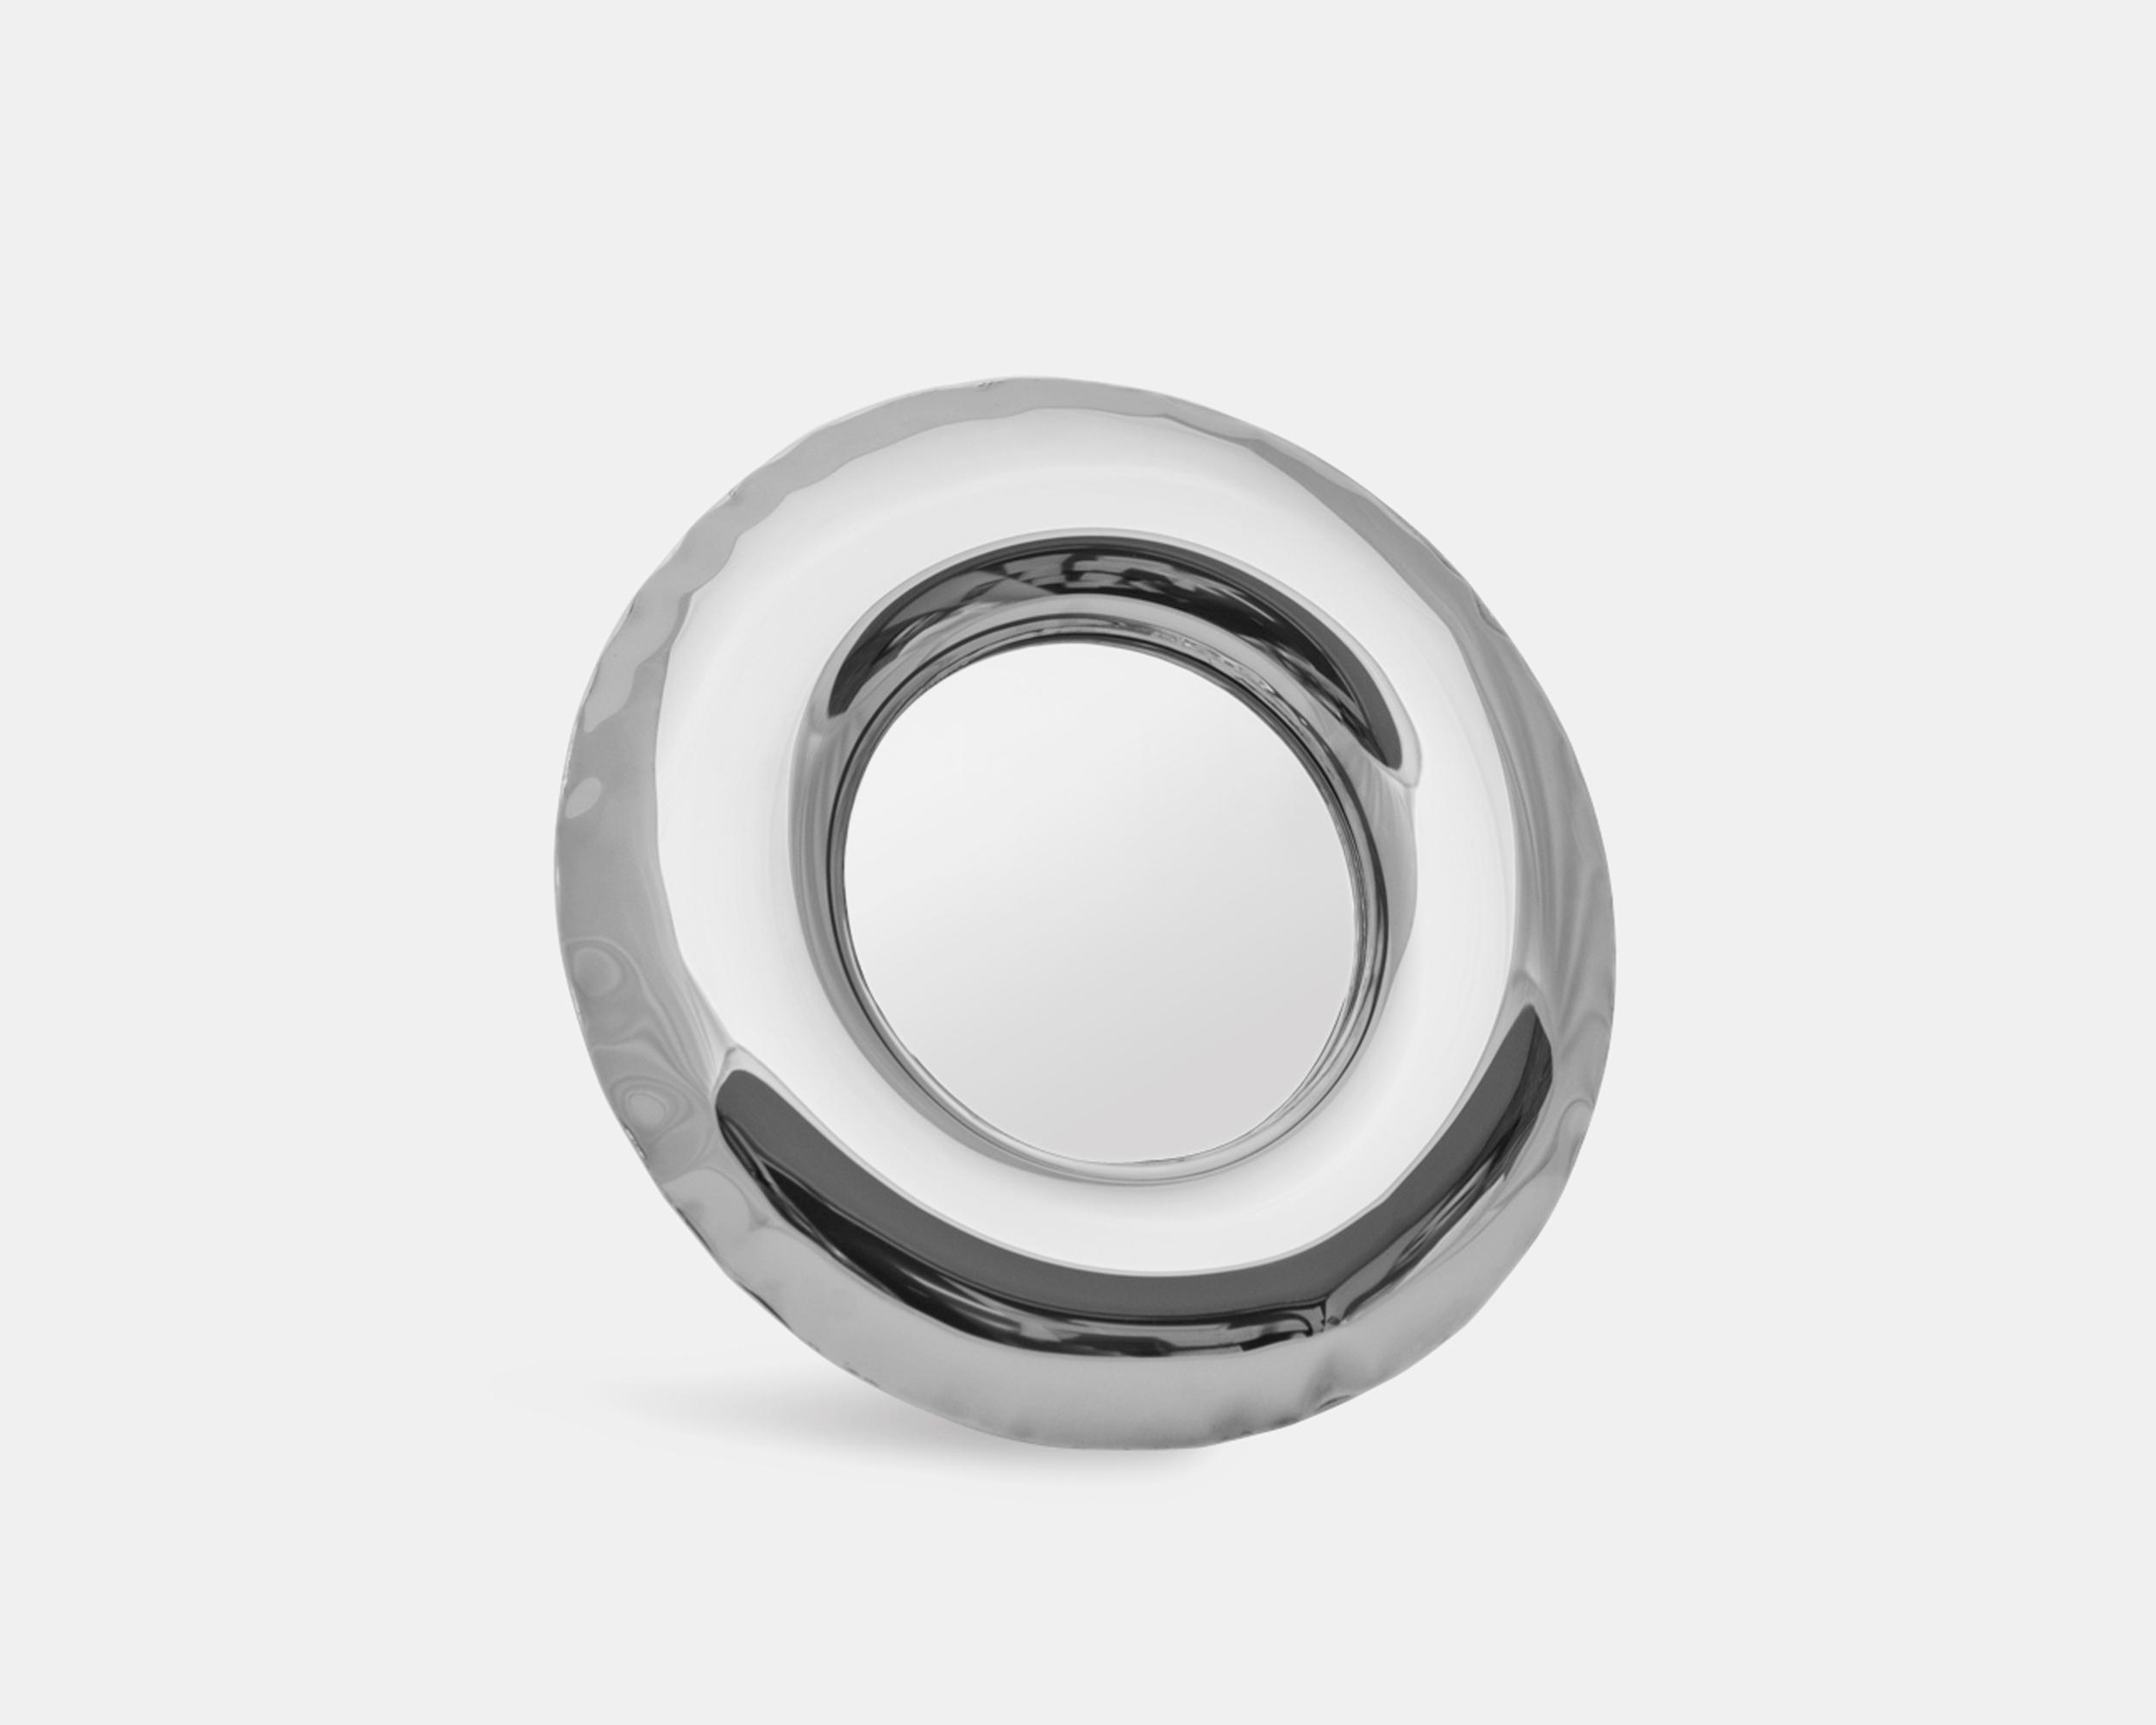 Zieta-Prozessdesign-Rondel-Mirror-Savannah-Bay-Gallery